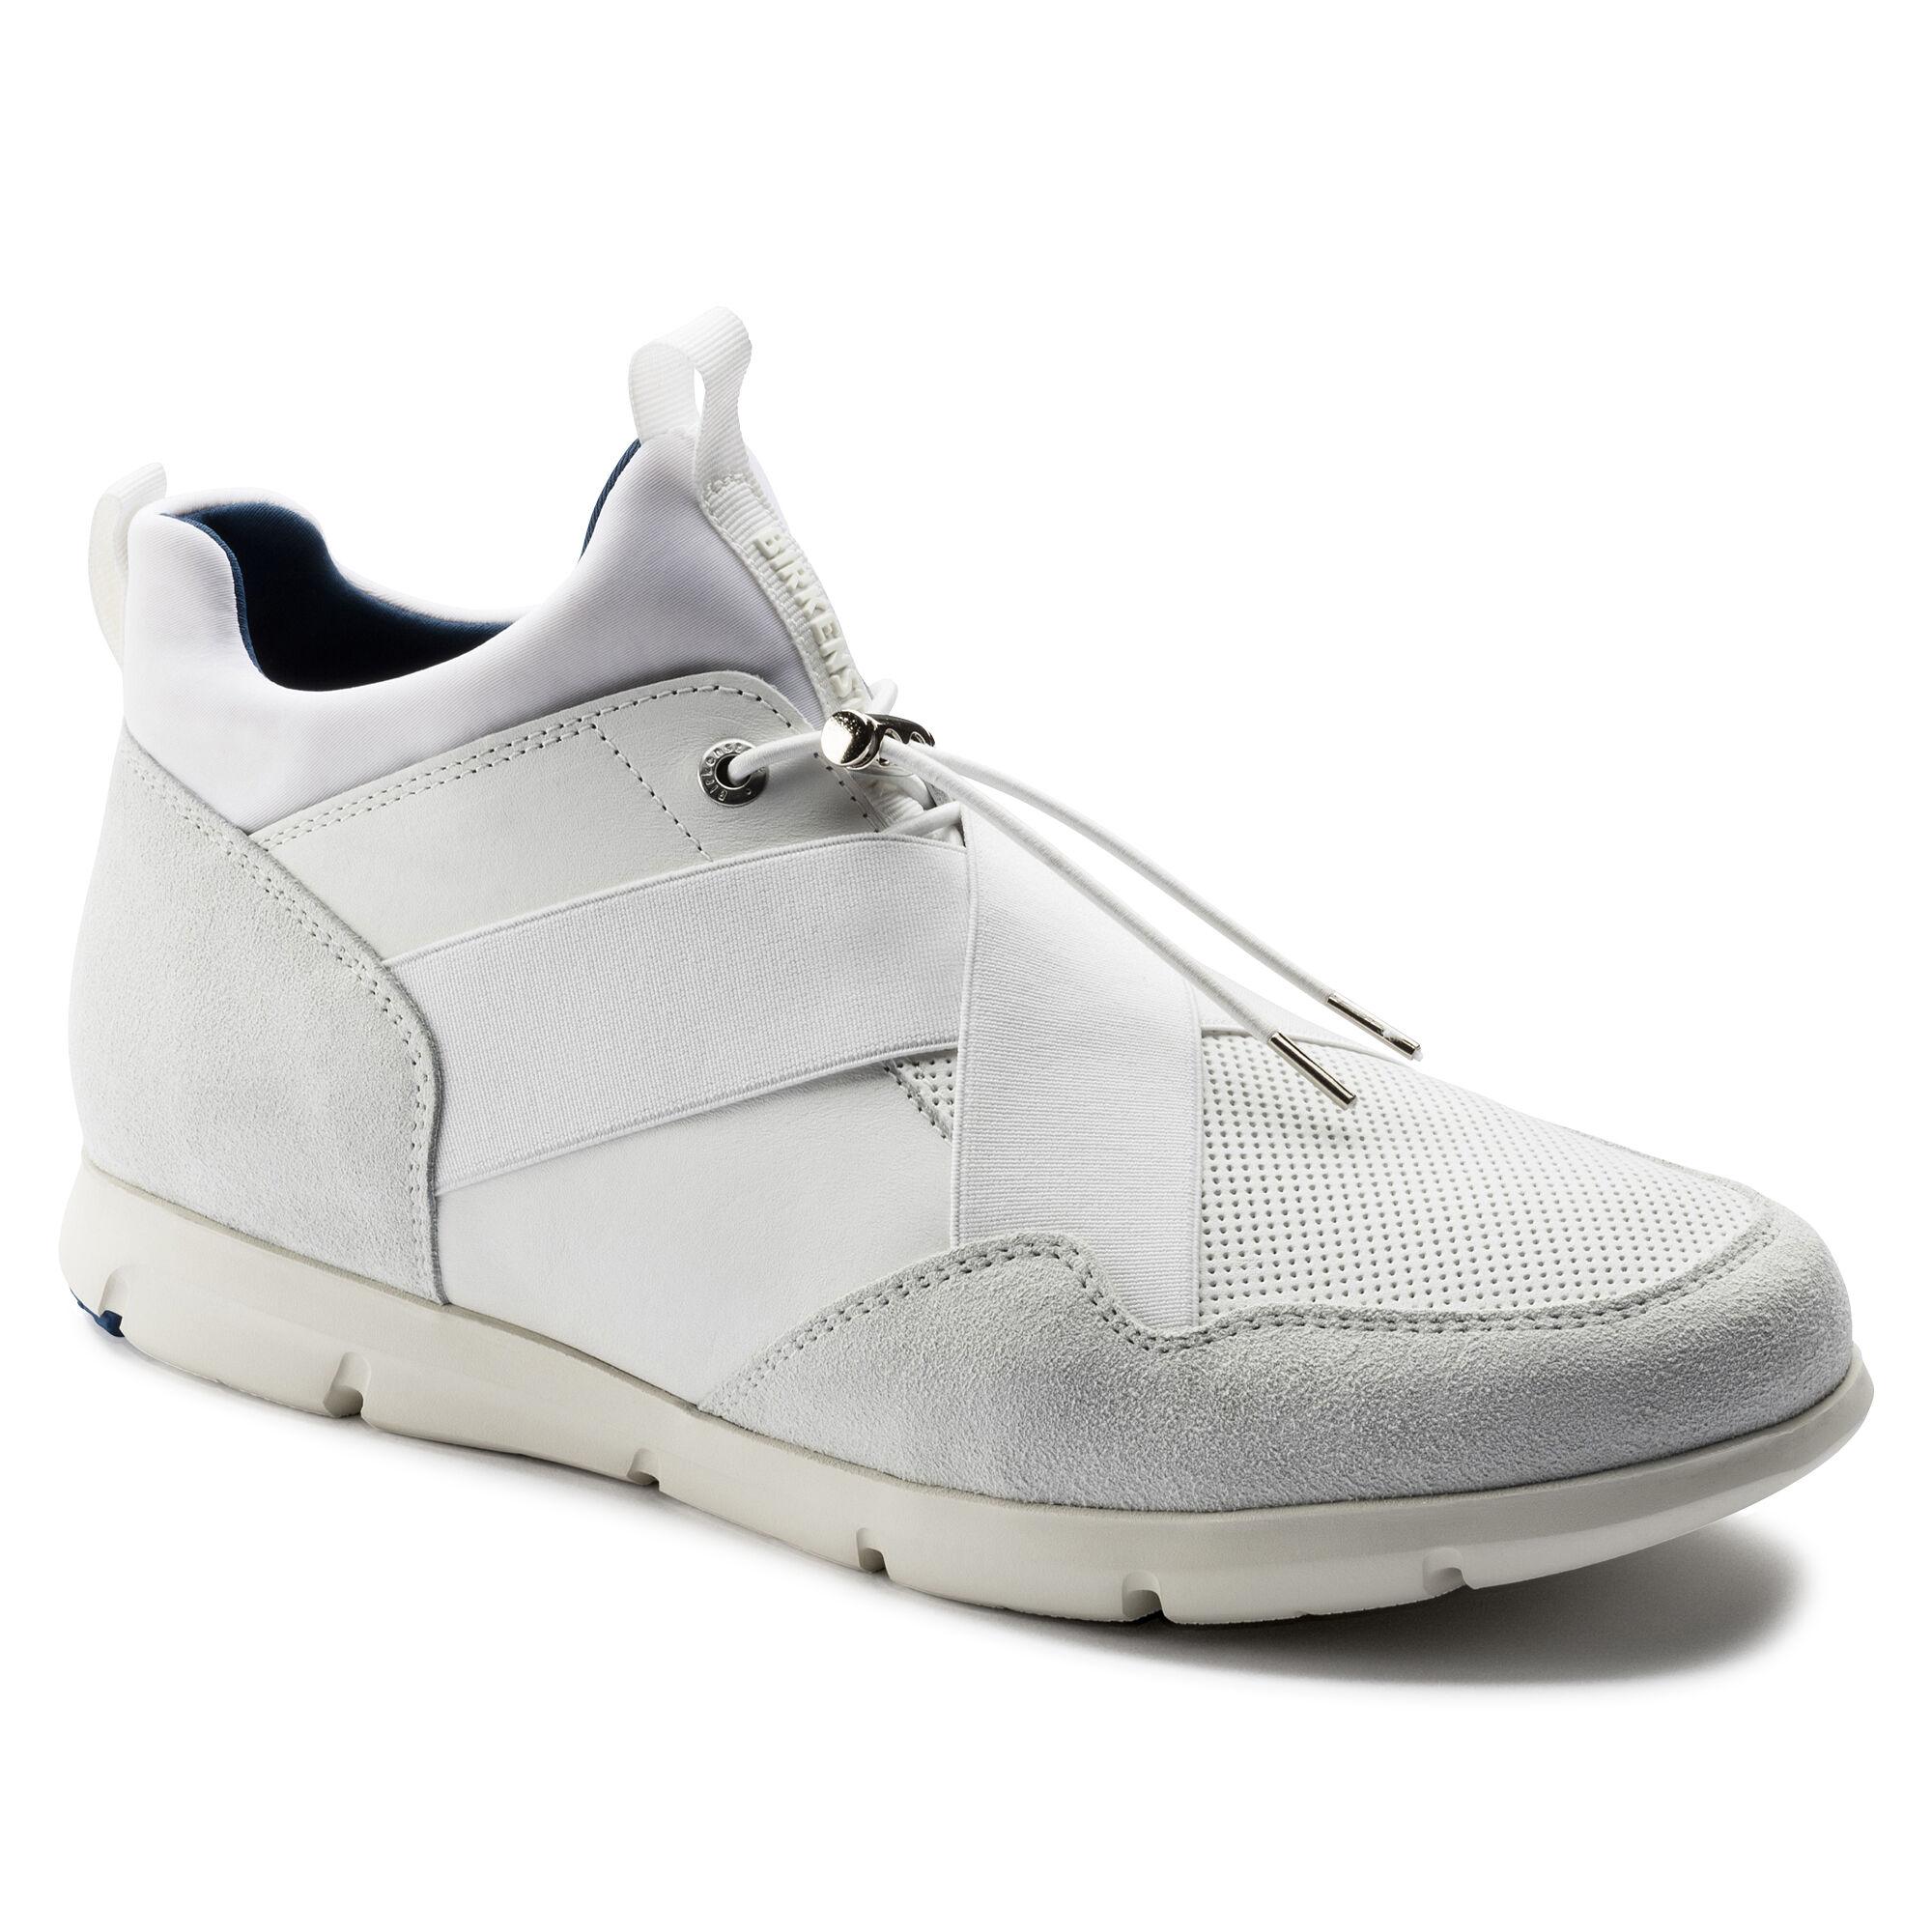 Sneaker für Herren | online kaufen bei BIRKENSTOCK